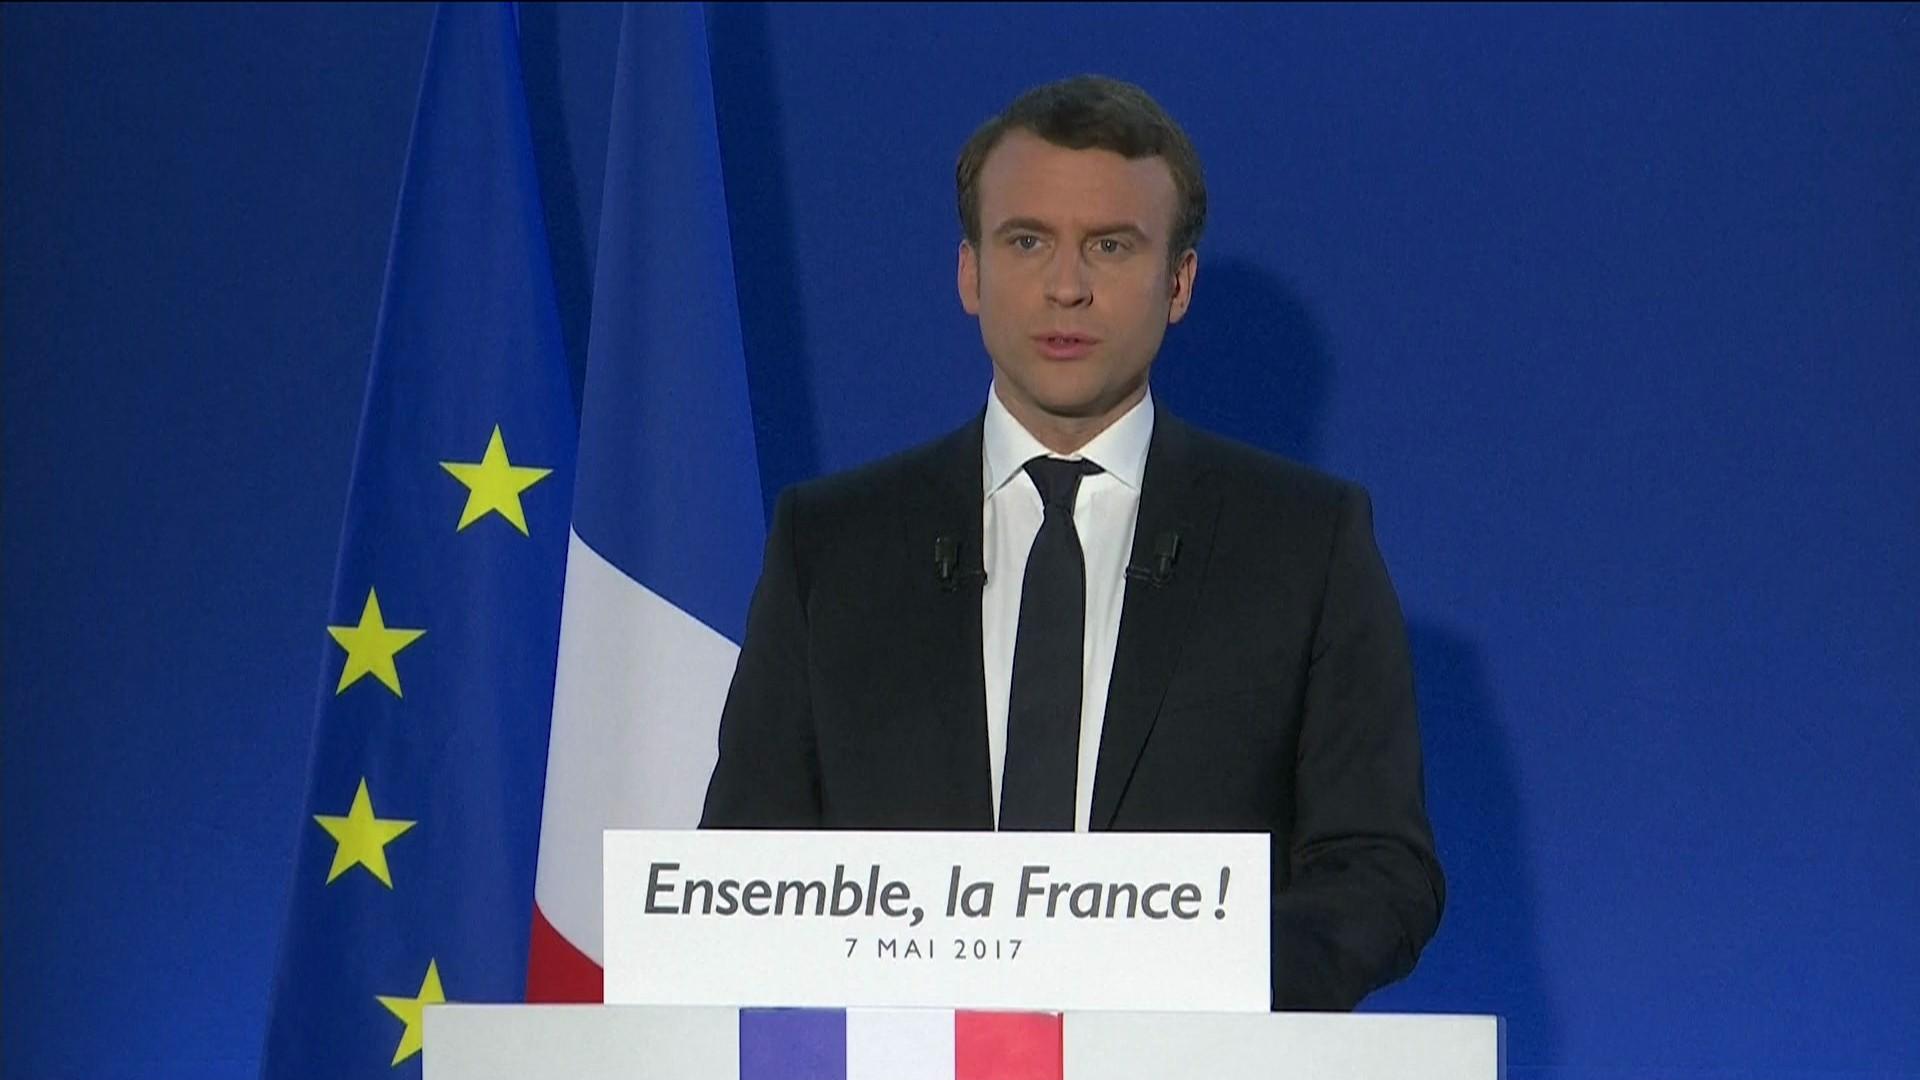 Emmanuel Macron discursa após vitória